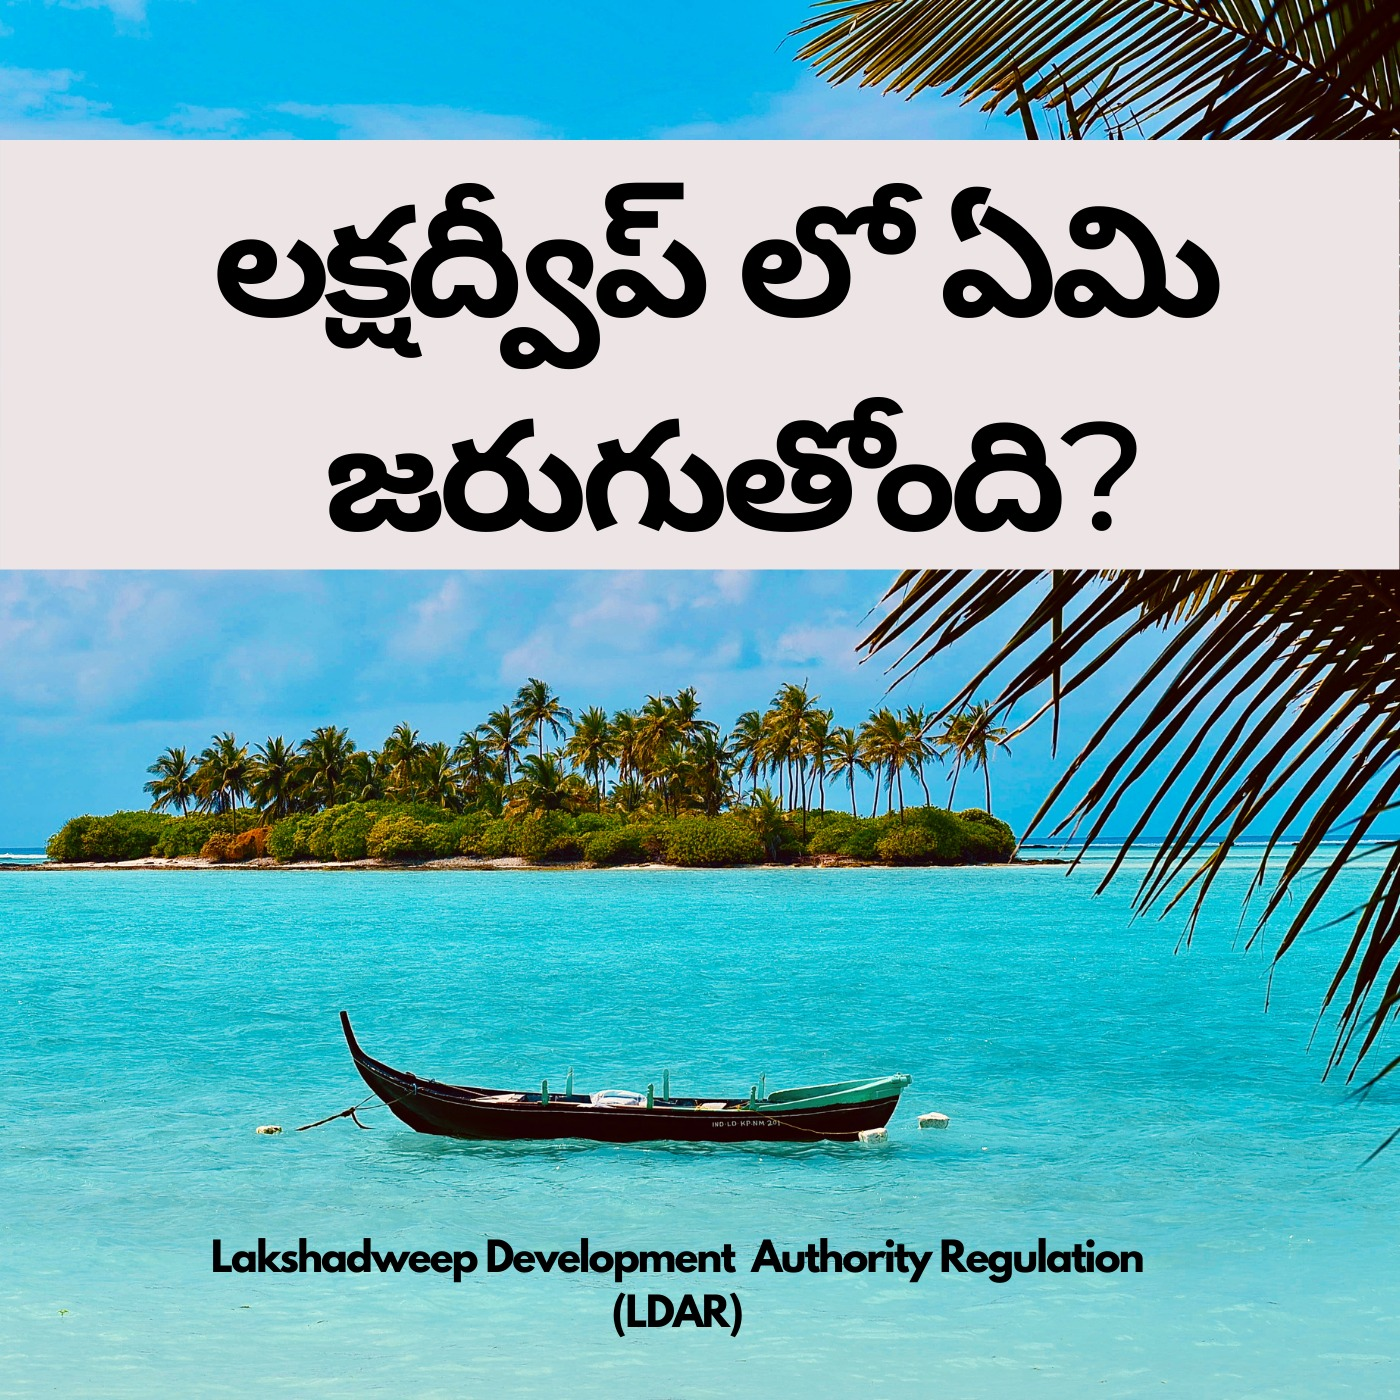 Whats happening with Lakshadweep? #SaveLakshadweep